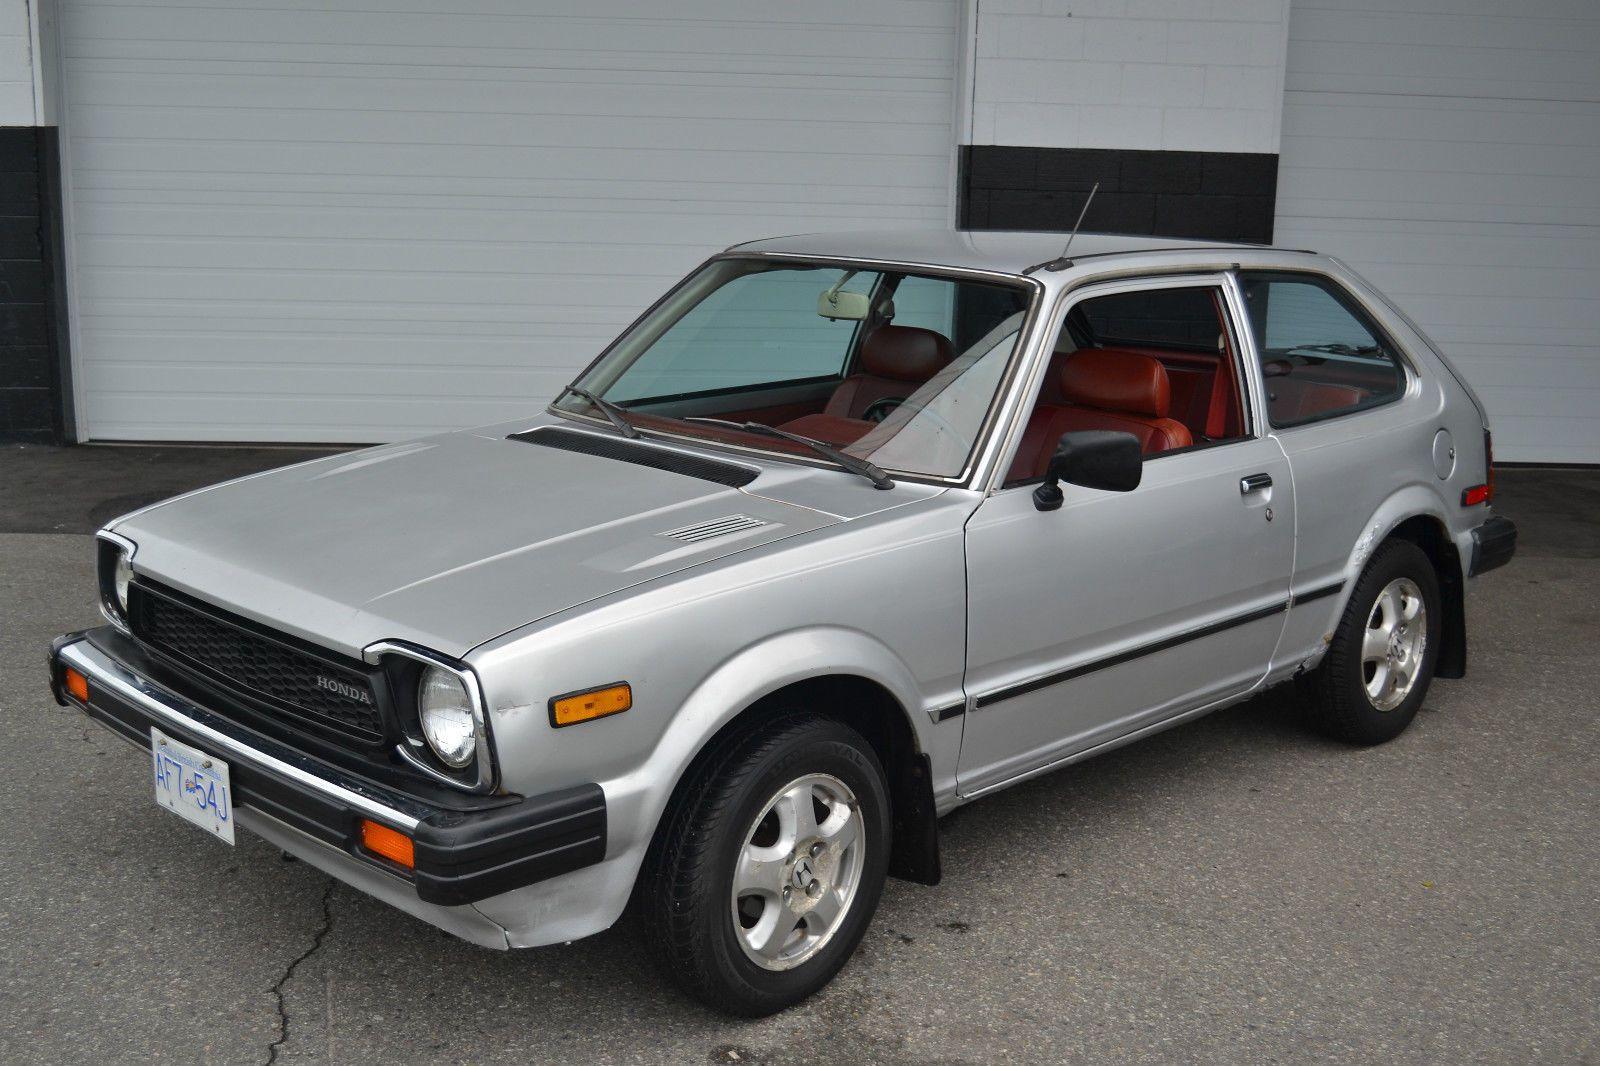 1980 Honda Civic for sale Honda civic, Honda civic for